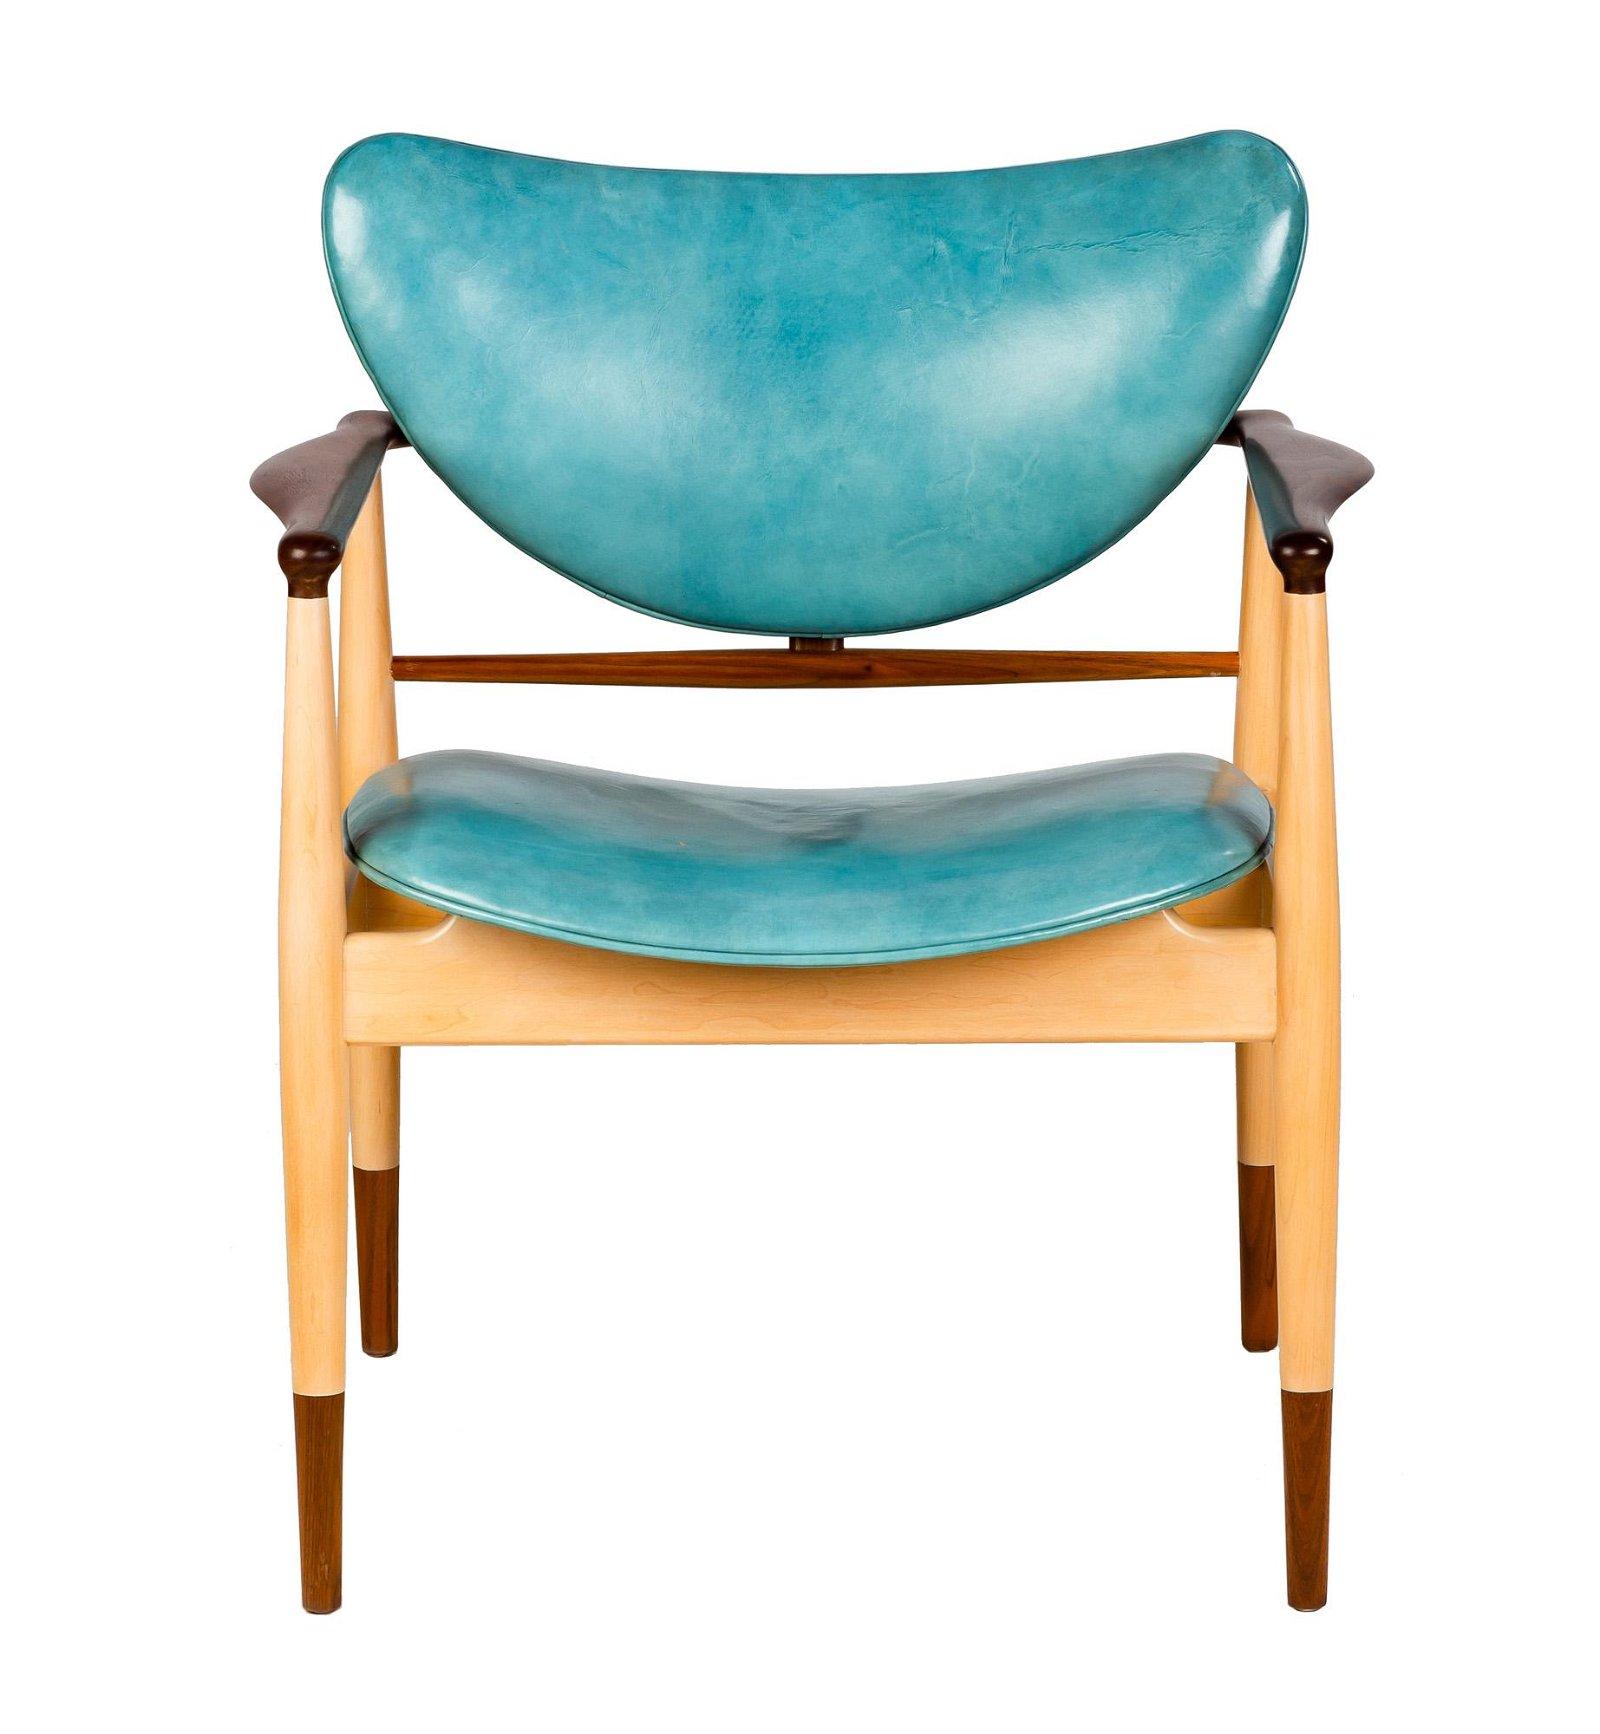 Finn Juhl (Danish, 1912-1989) Chair 48 Series